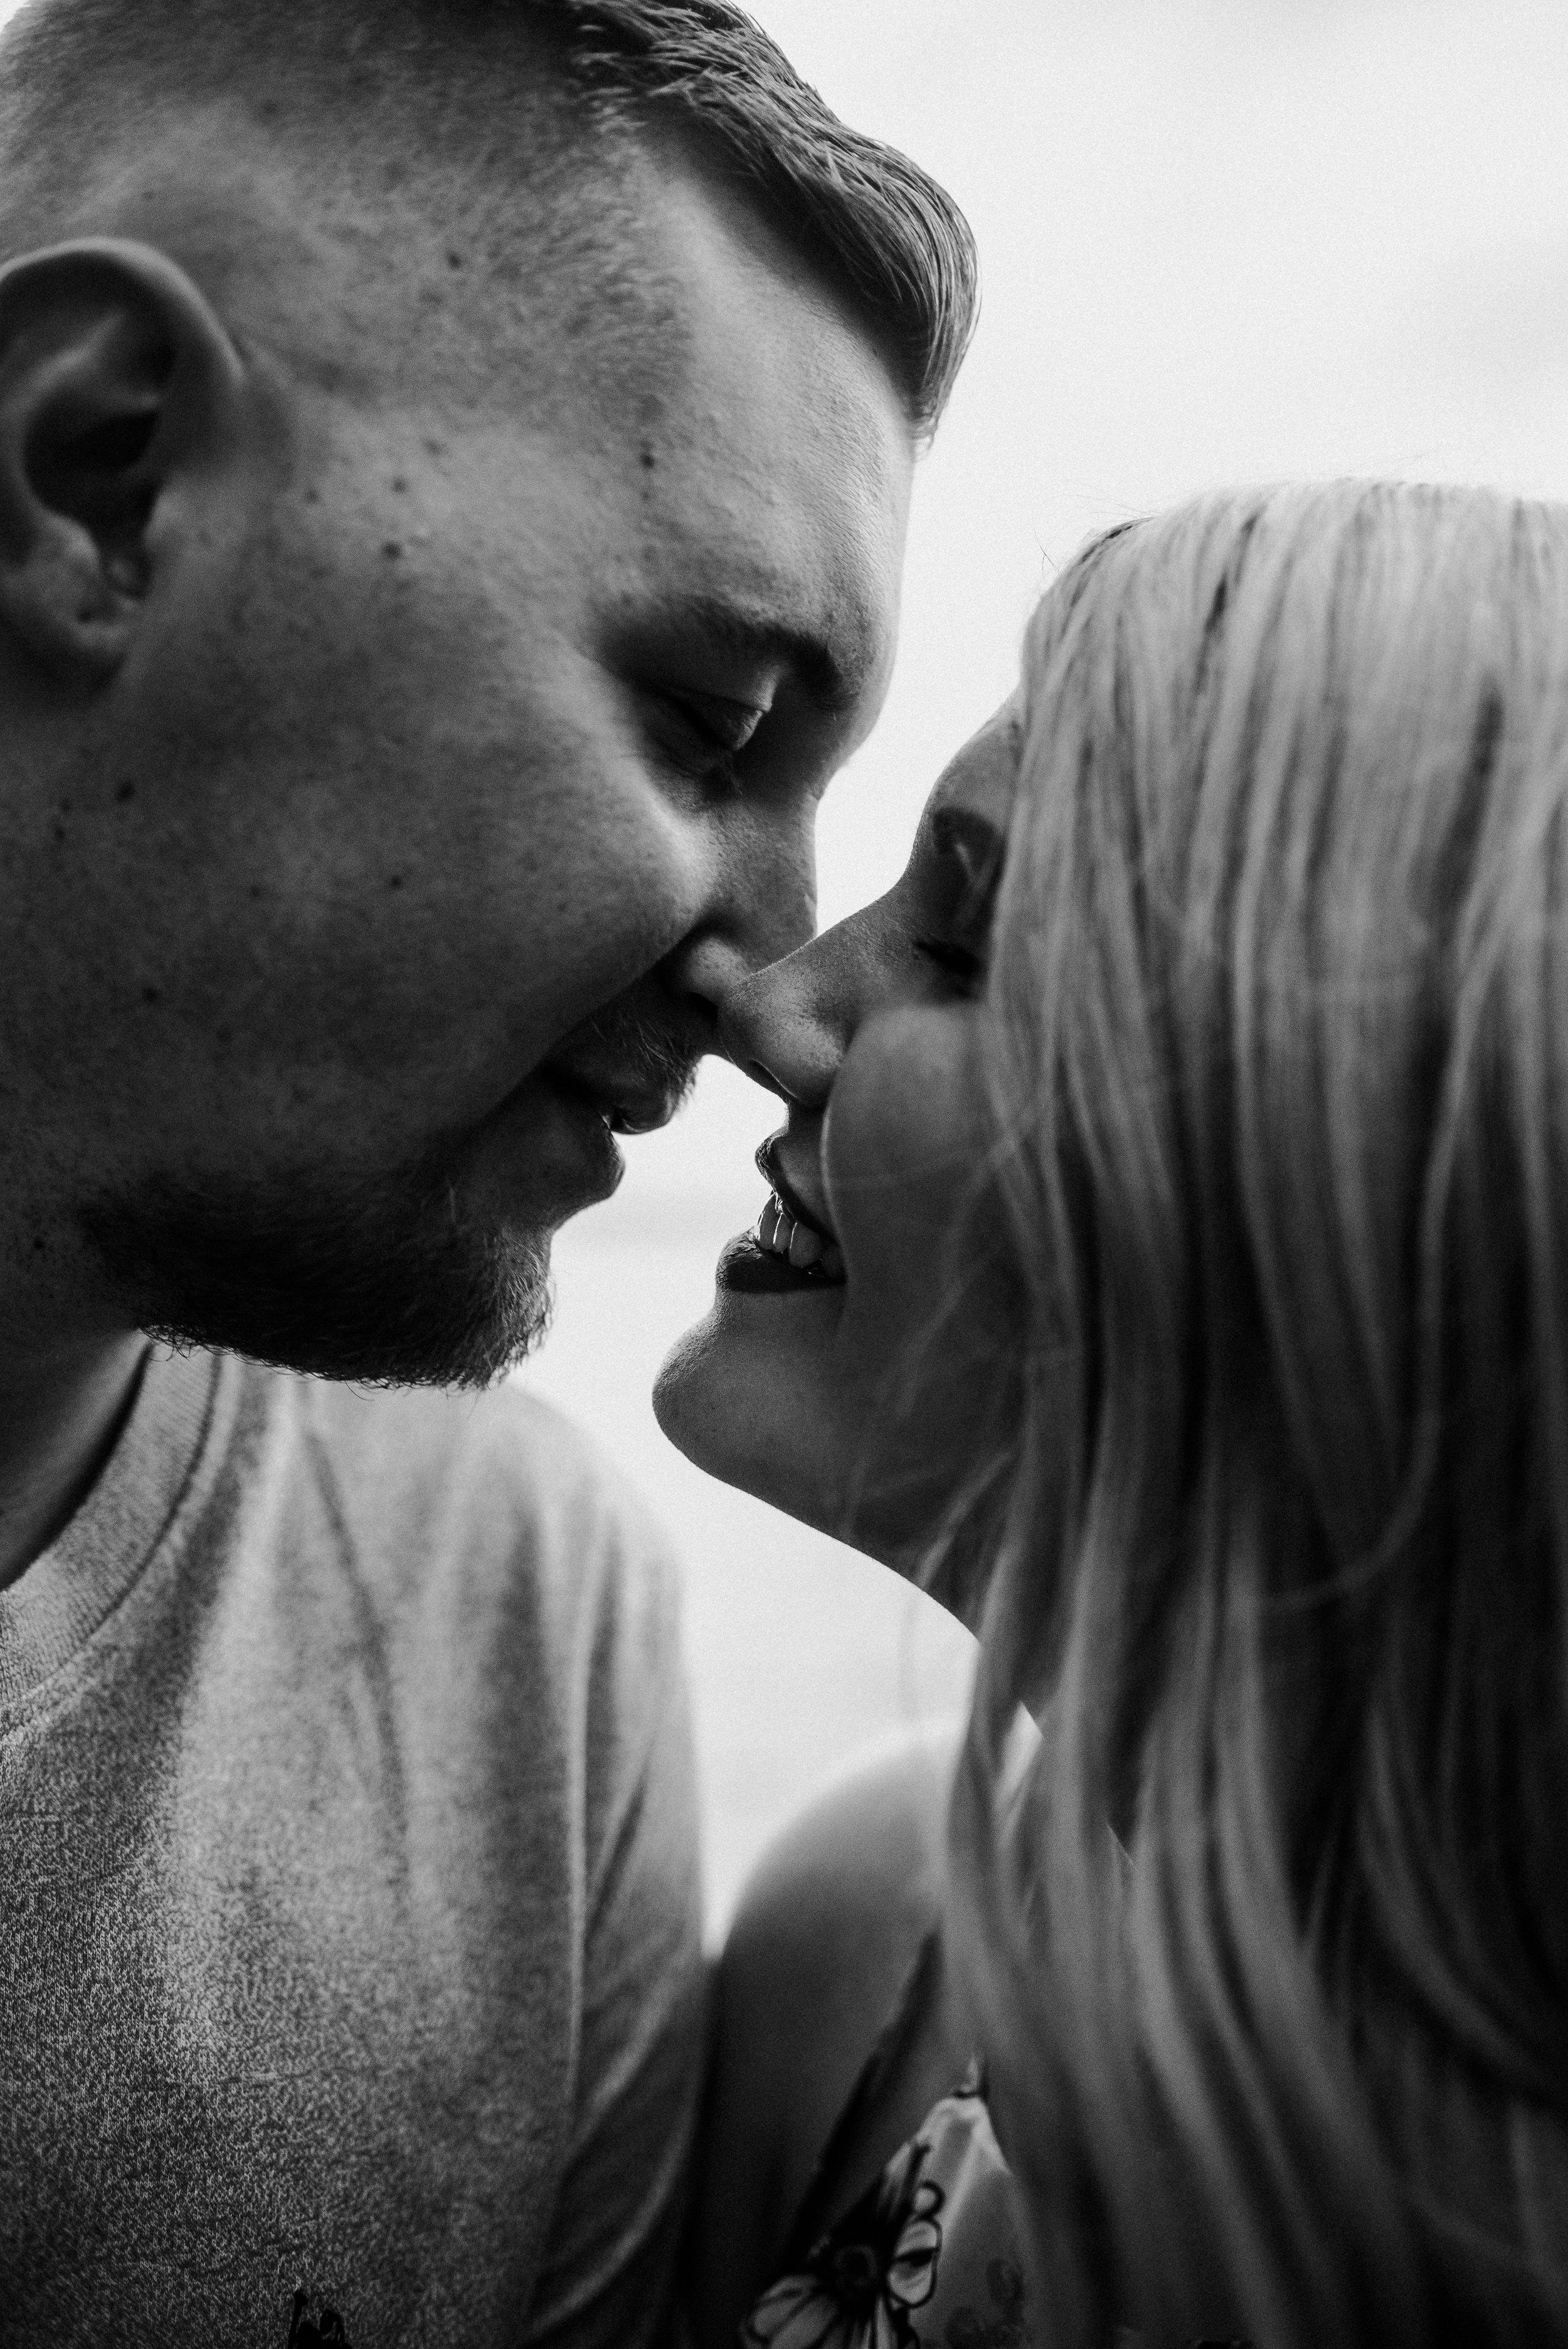 kimberly-trey-crestview-florida-couples-photographer-65.jpg